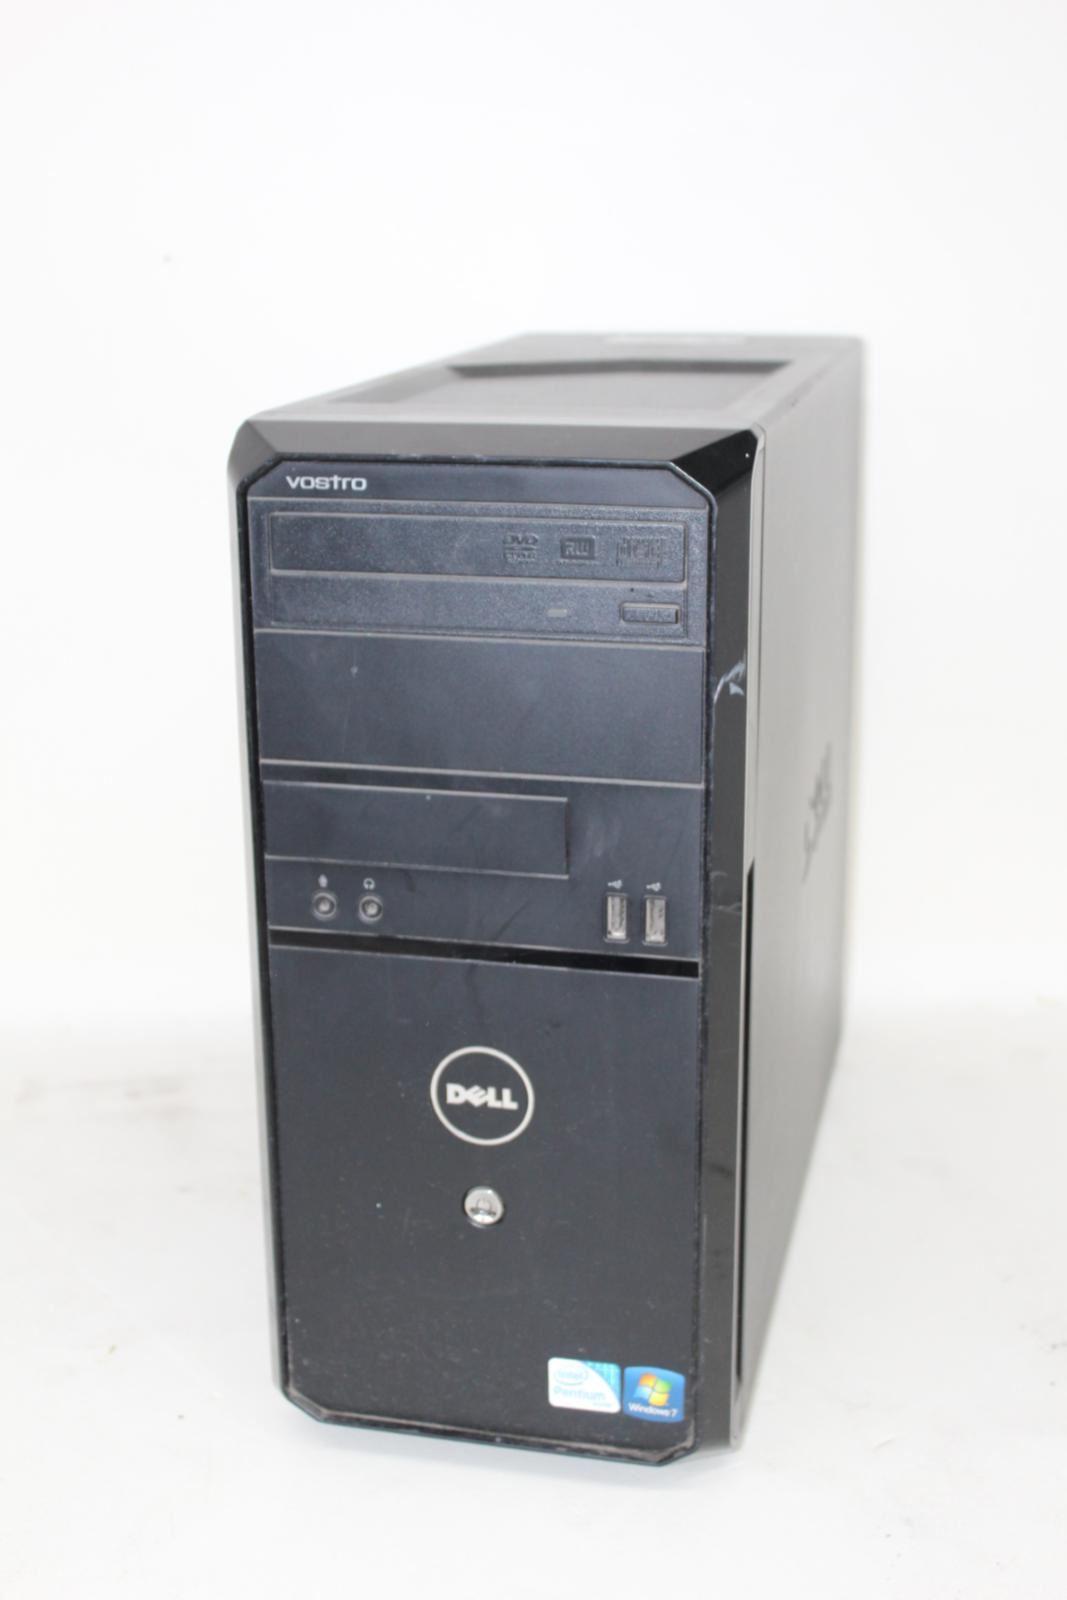 DELL-Vostro-No-Hard-Drive-2GB-Ram-Intel-Pentium-3-10GHz-Desktop-Tower-Computer